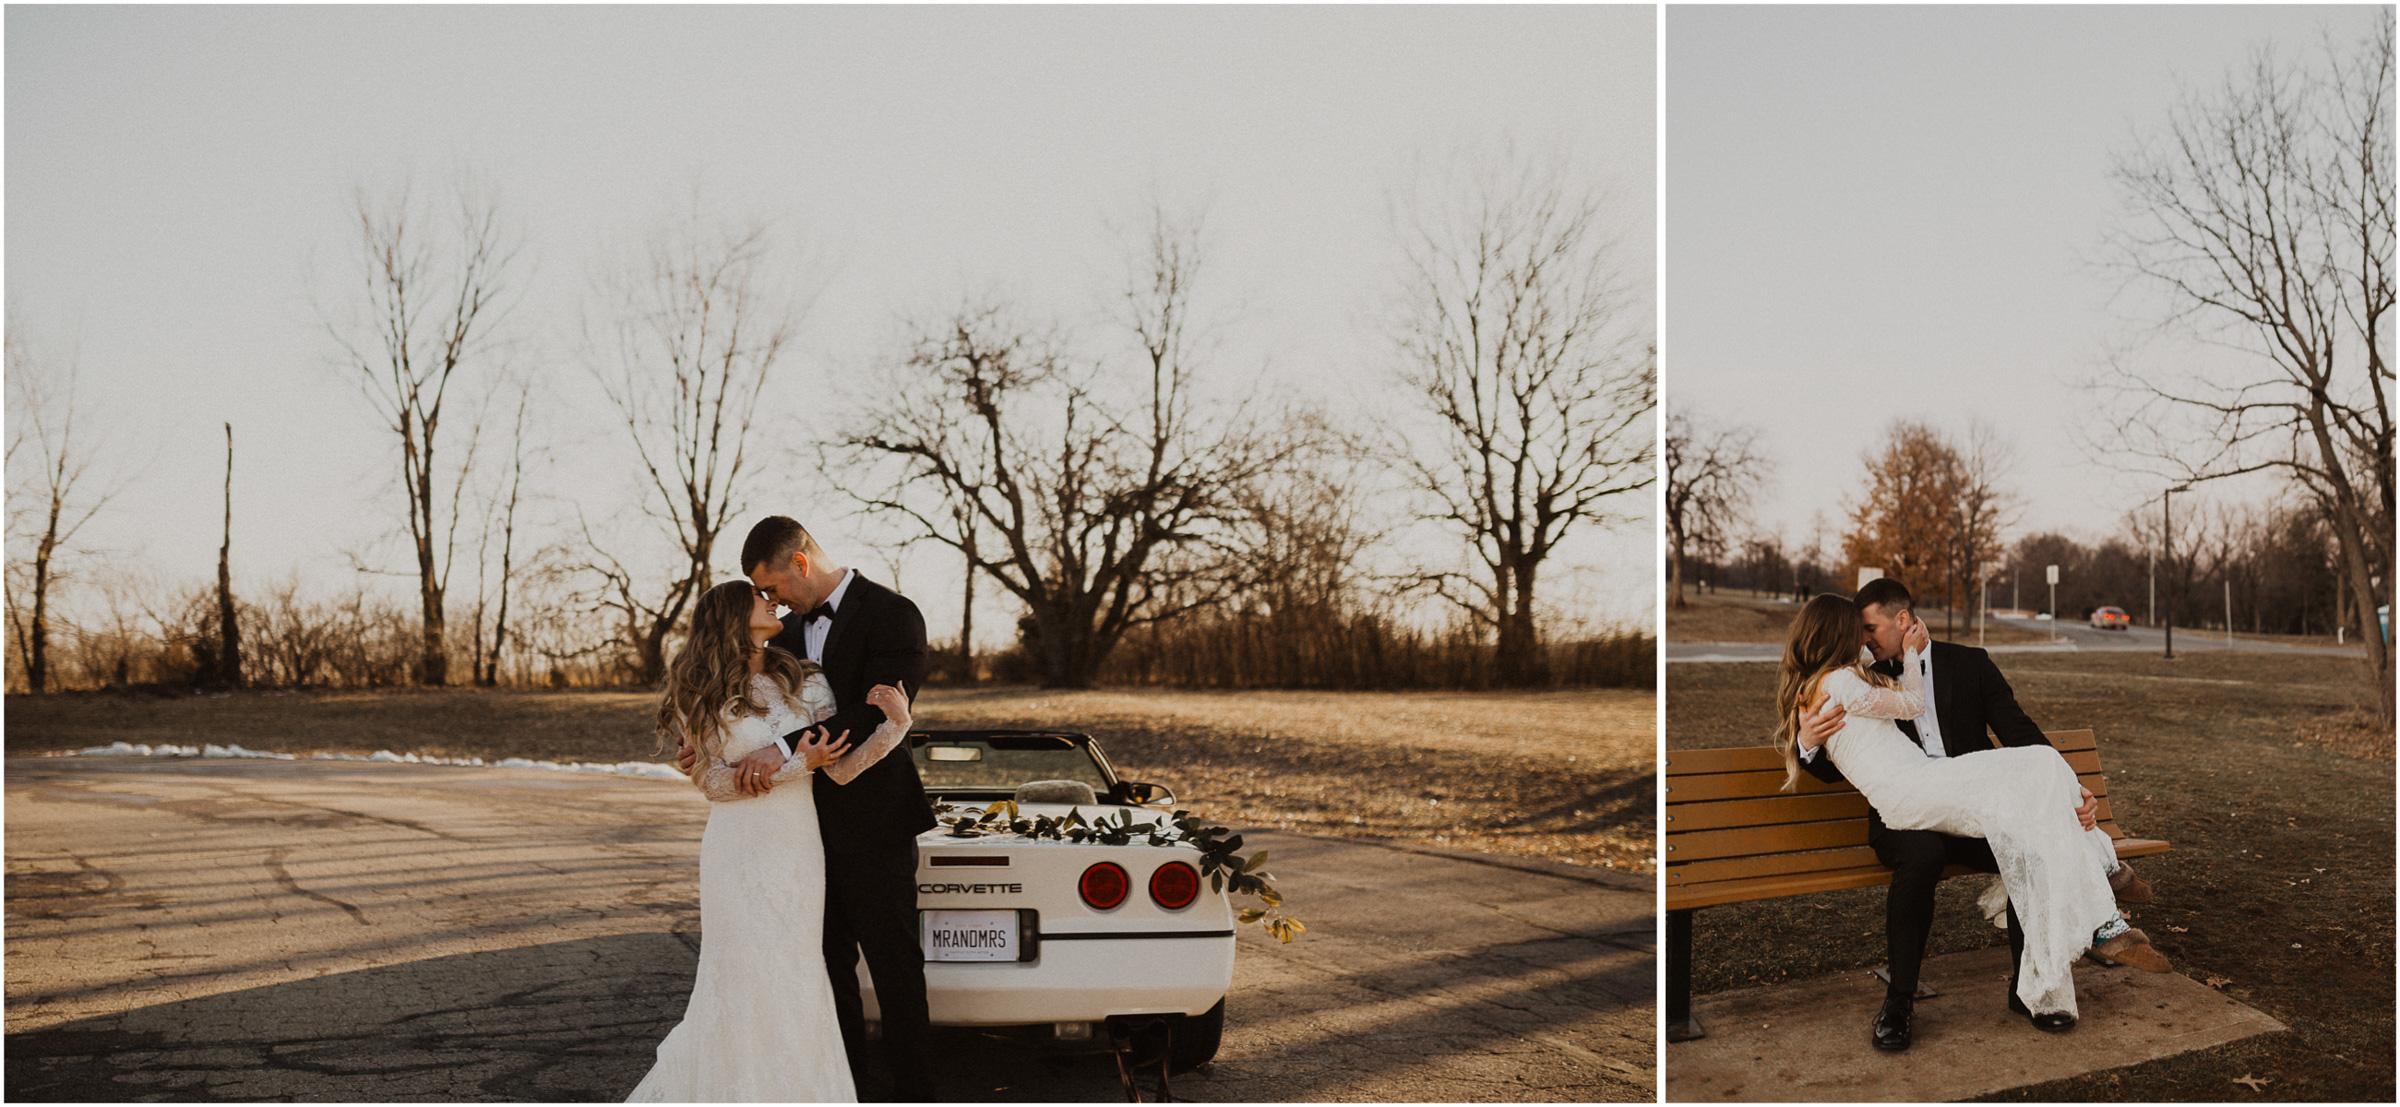 alyssa barletter photography shawnee mission park winter wedding 8th and main grandview missouri photographer-35.jpg